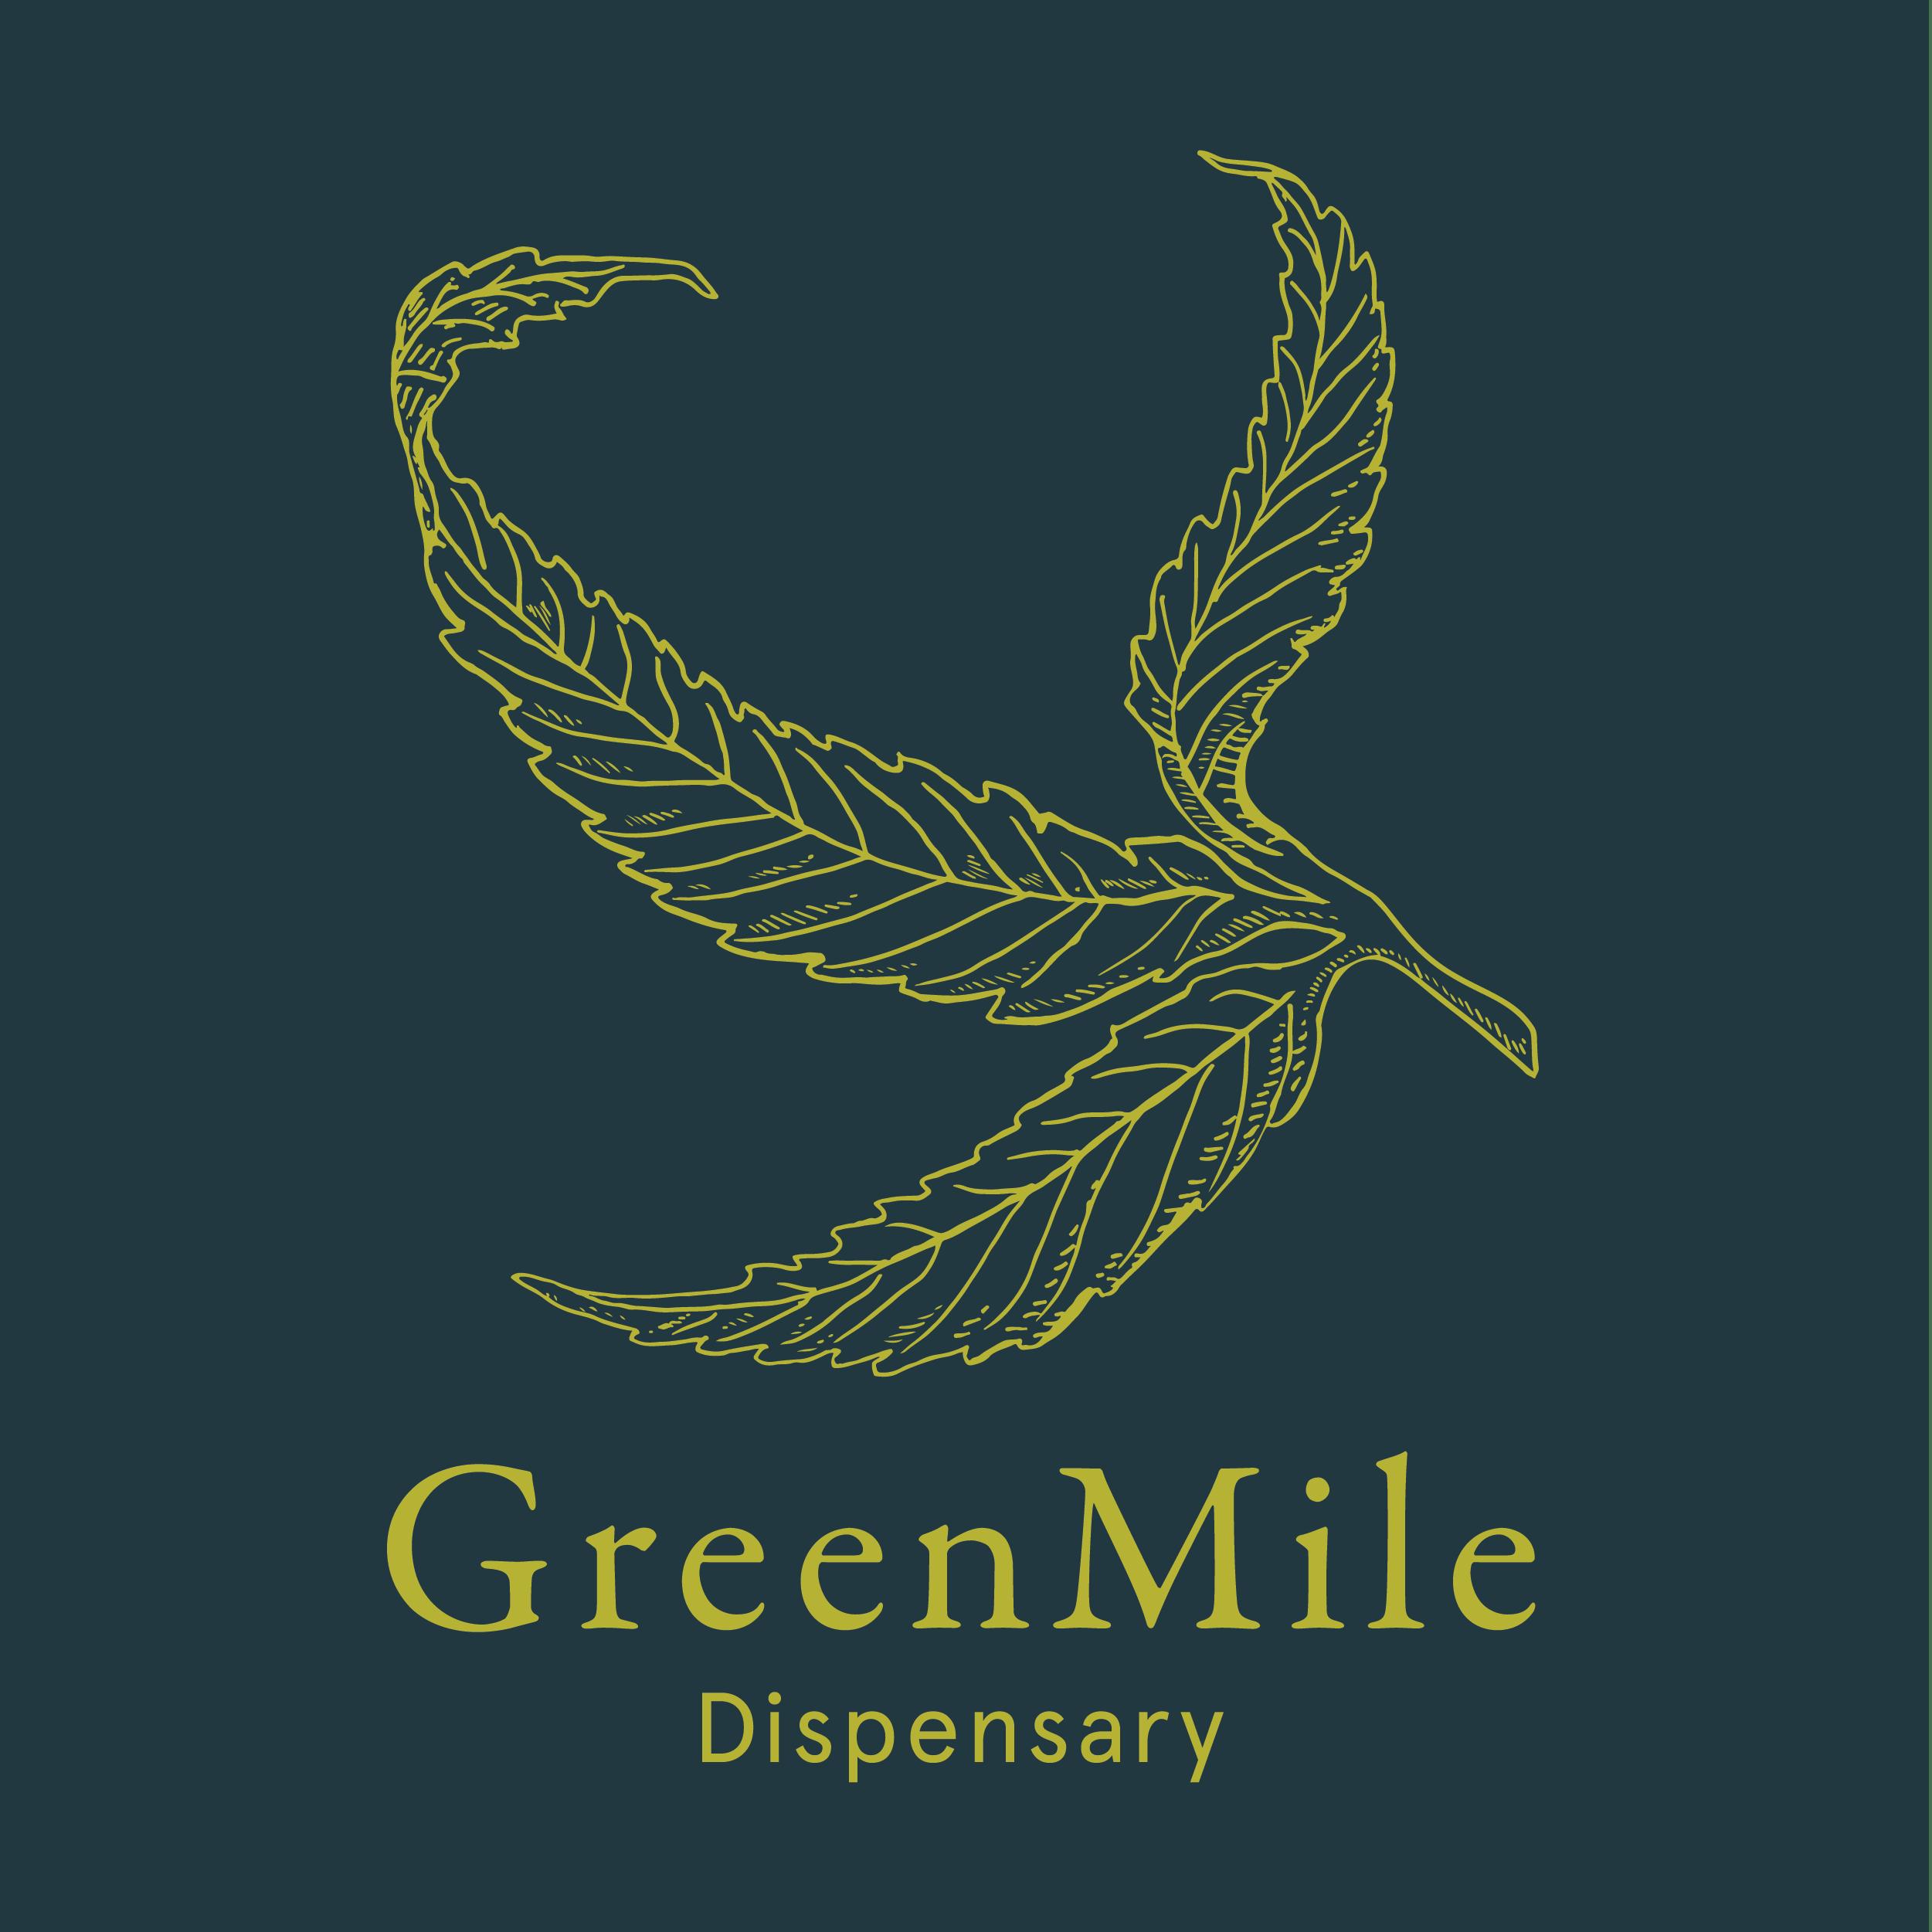 GreenMile Dispensary